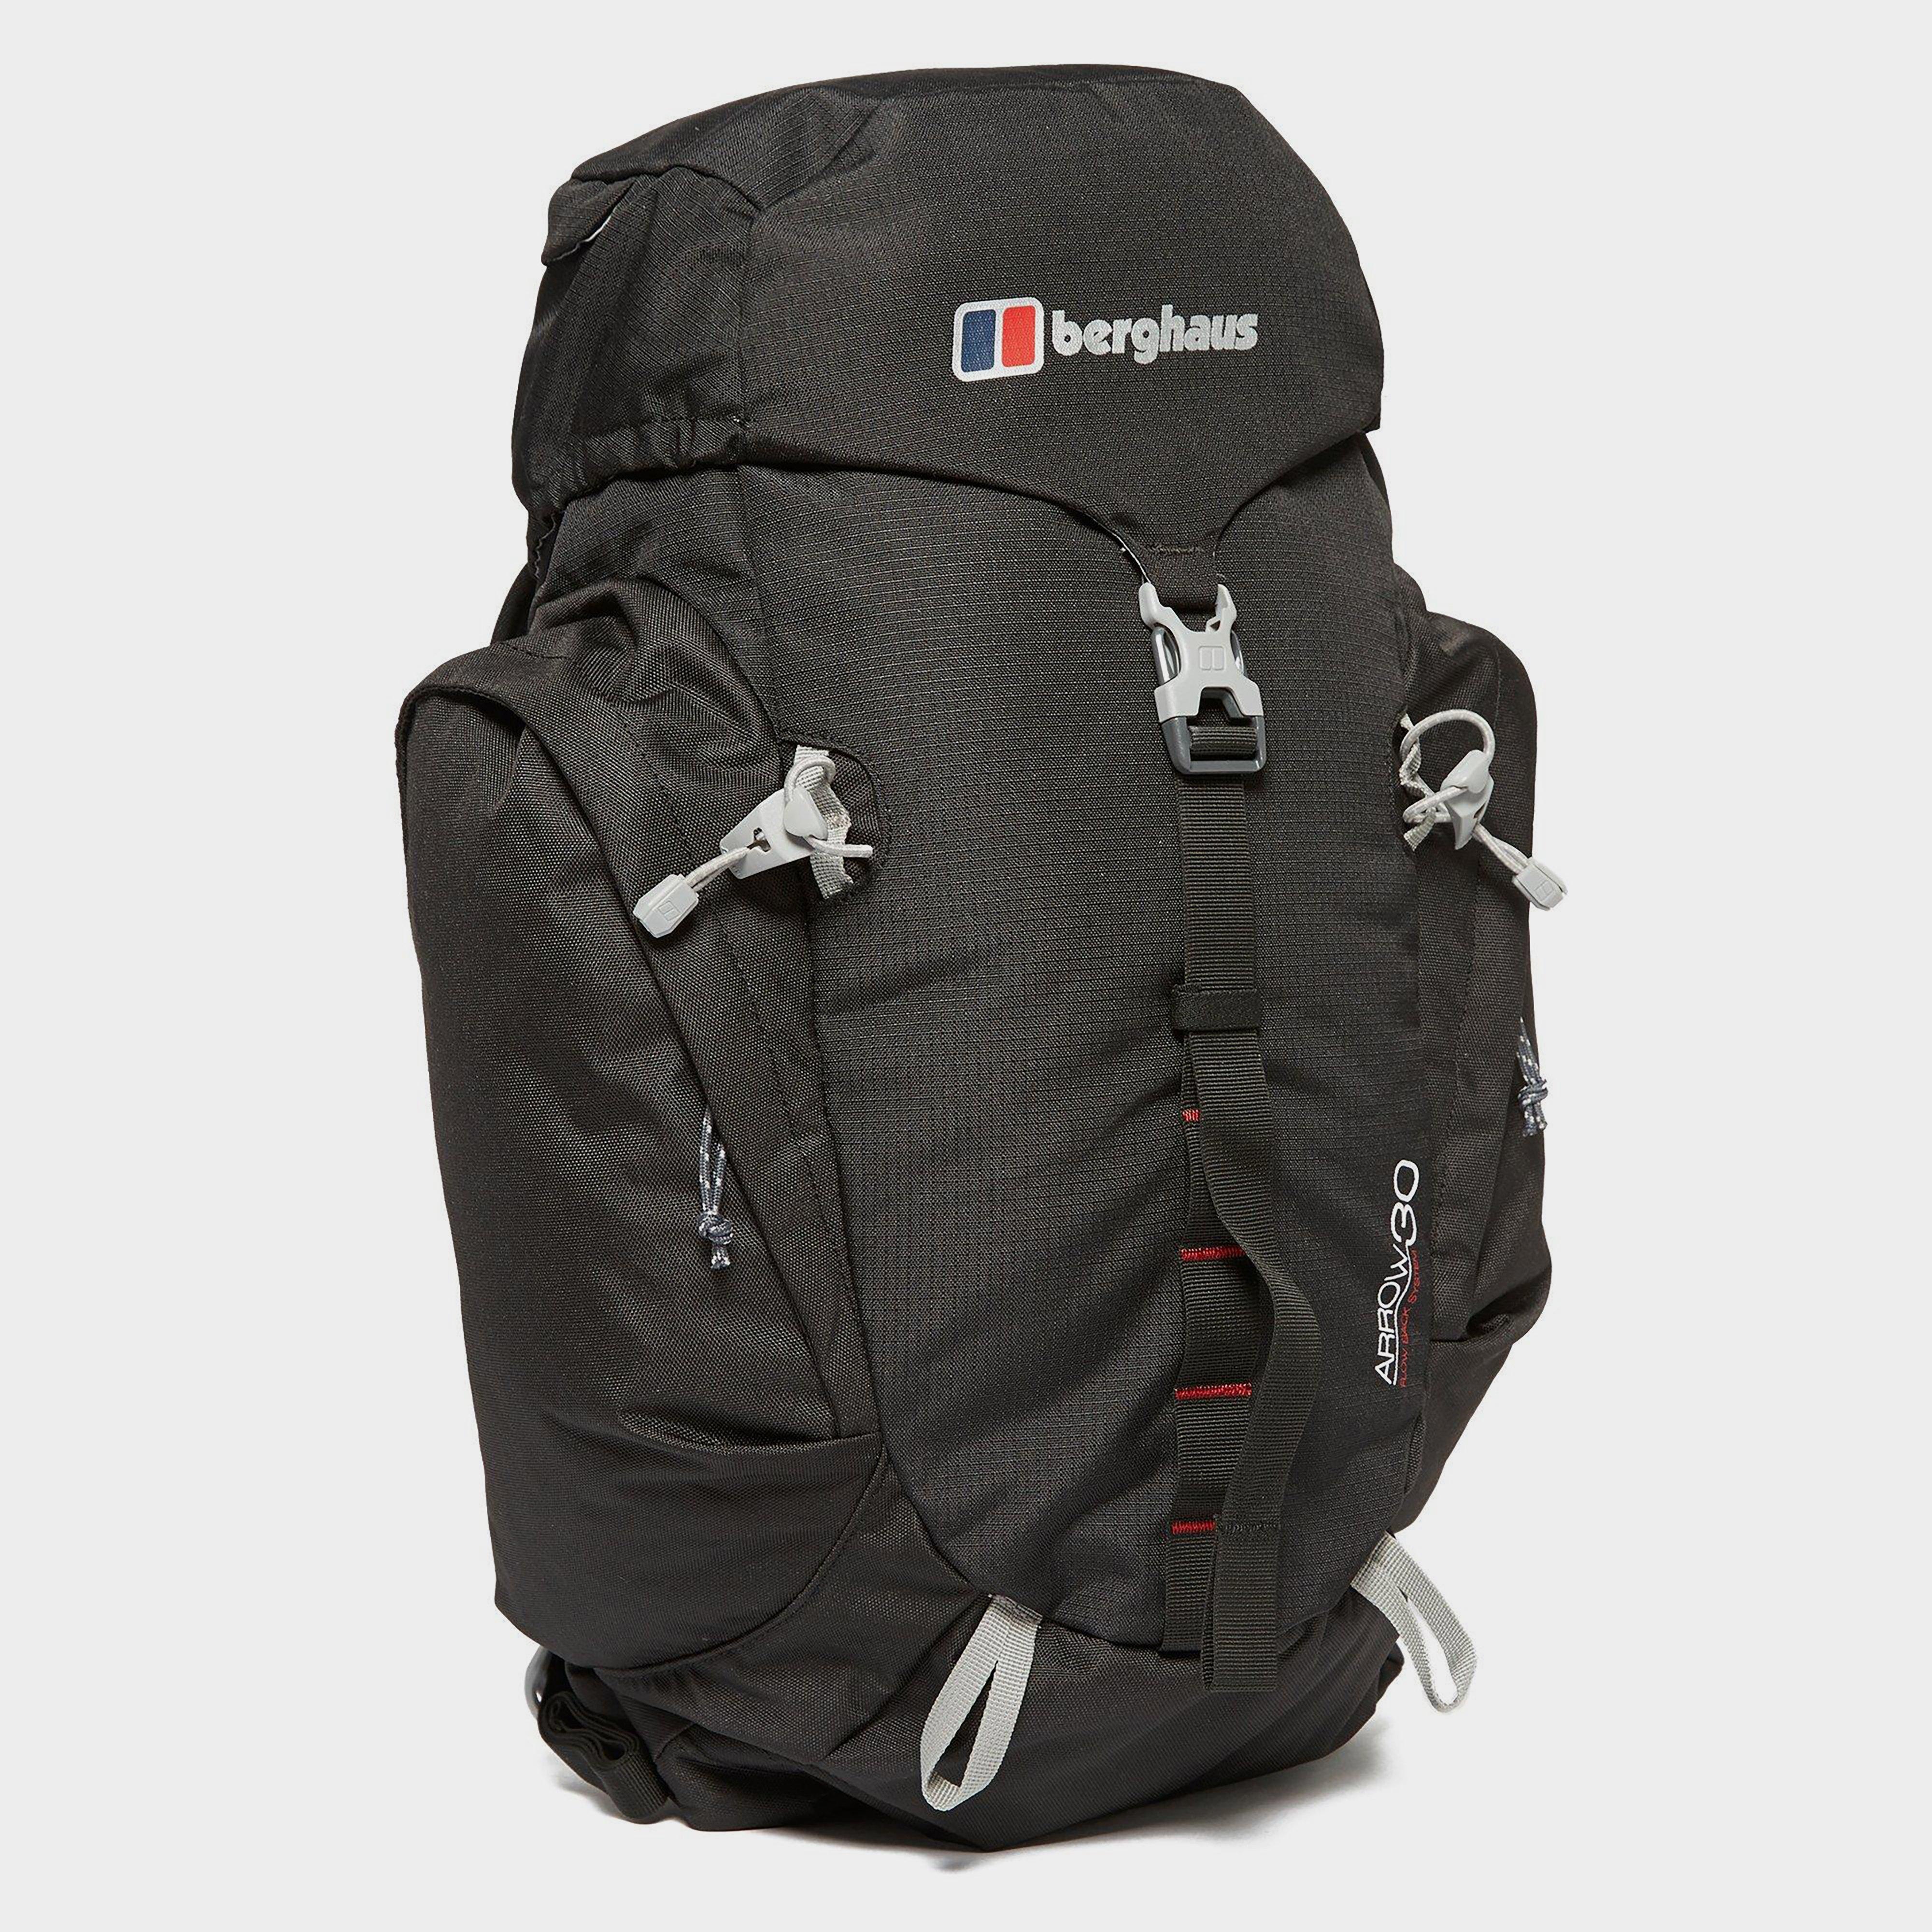 Berghaus Arrow 30 Rucksack - Black, Black